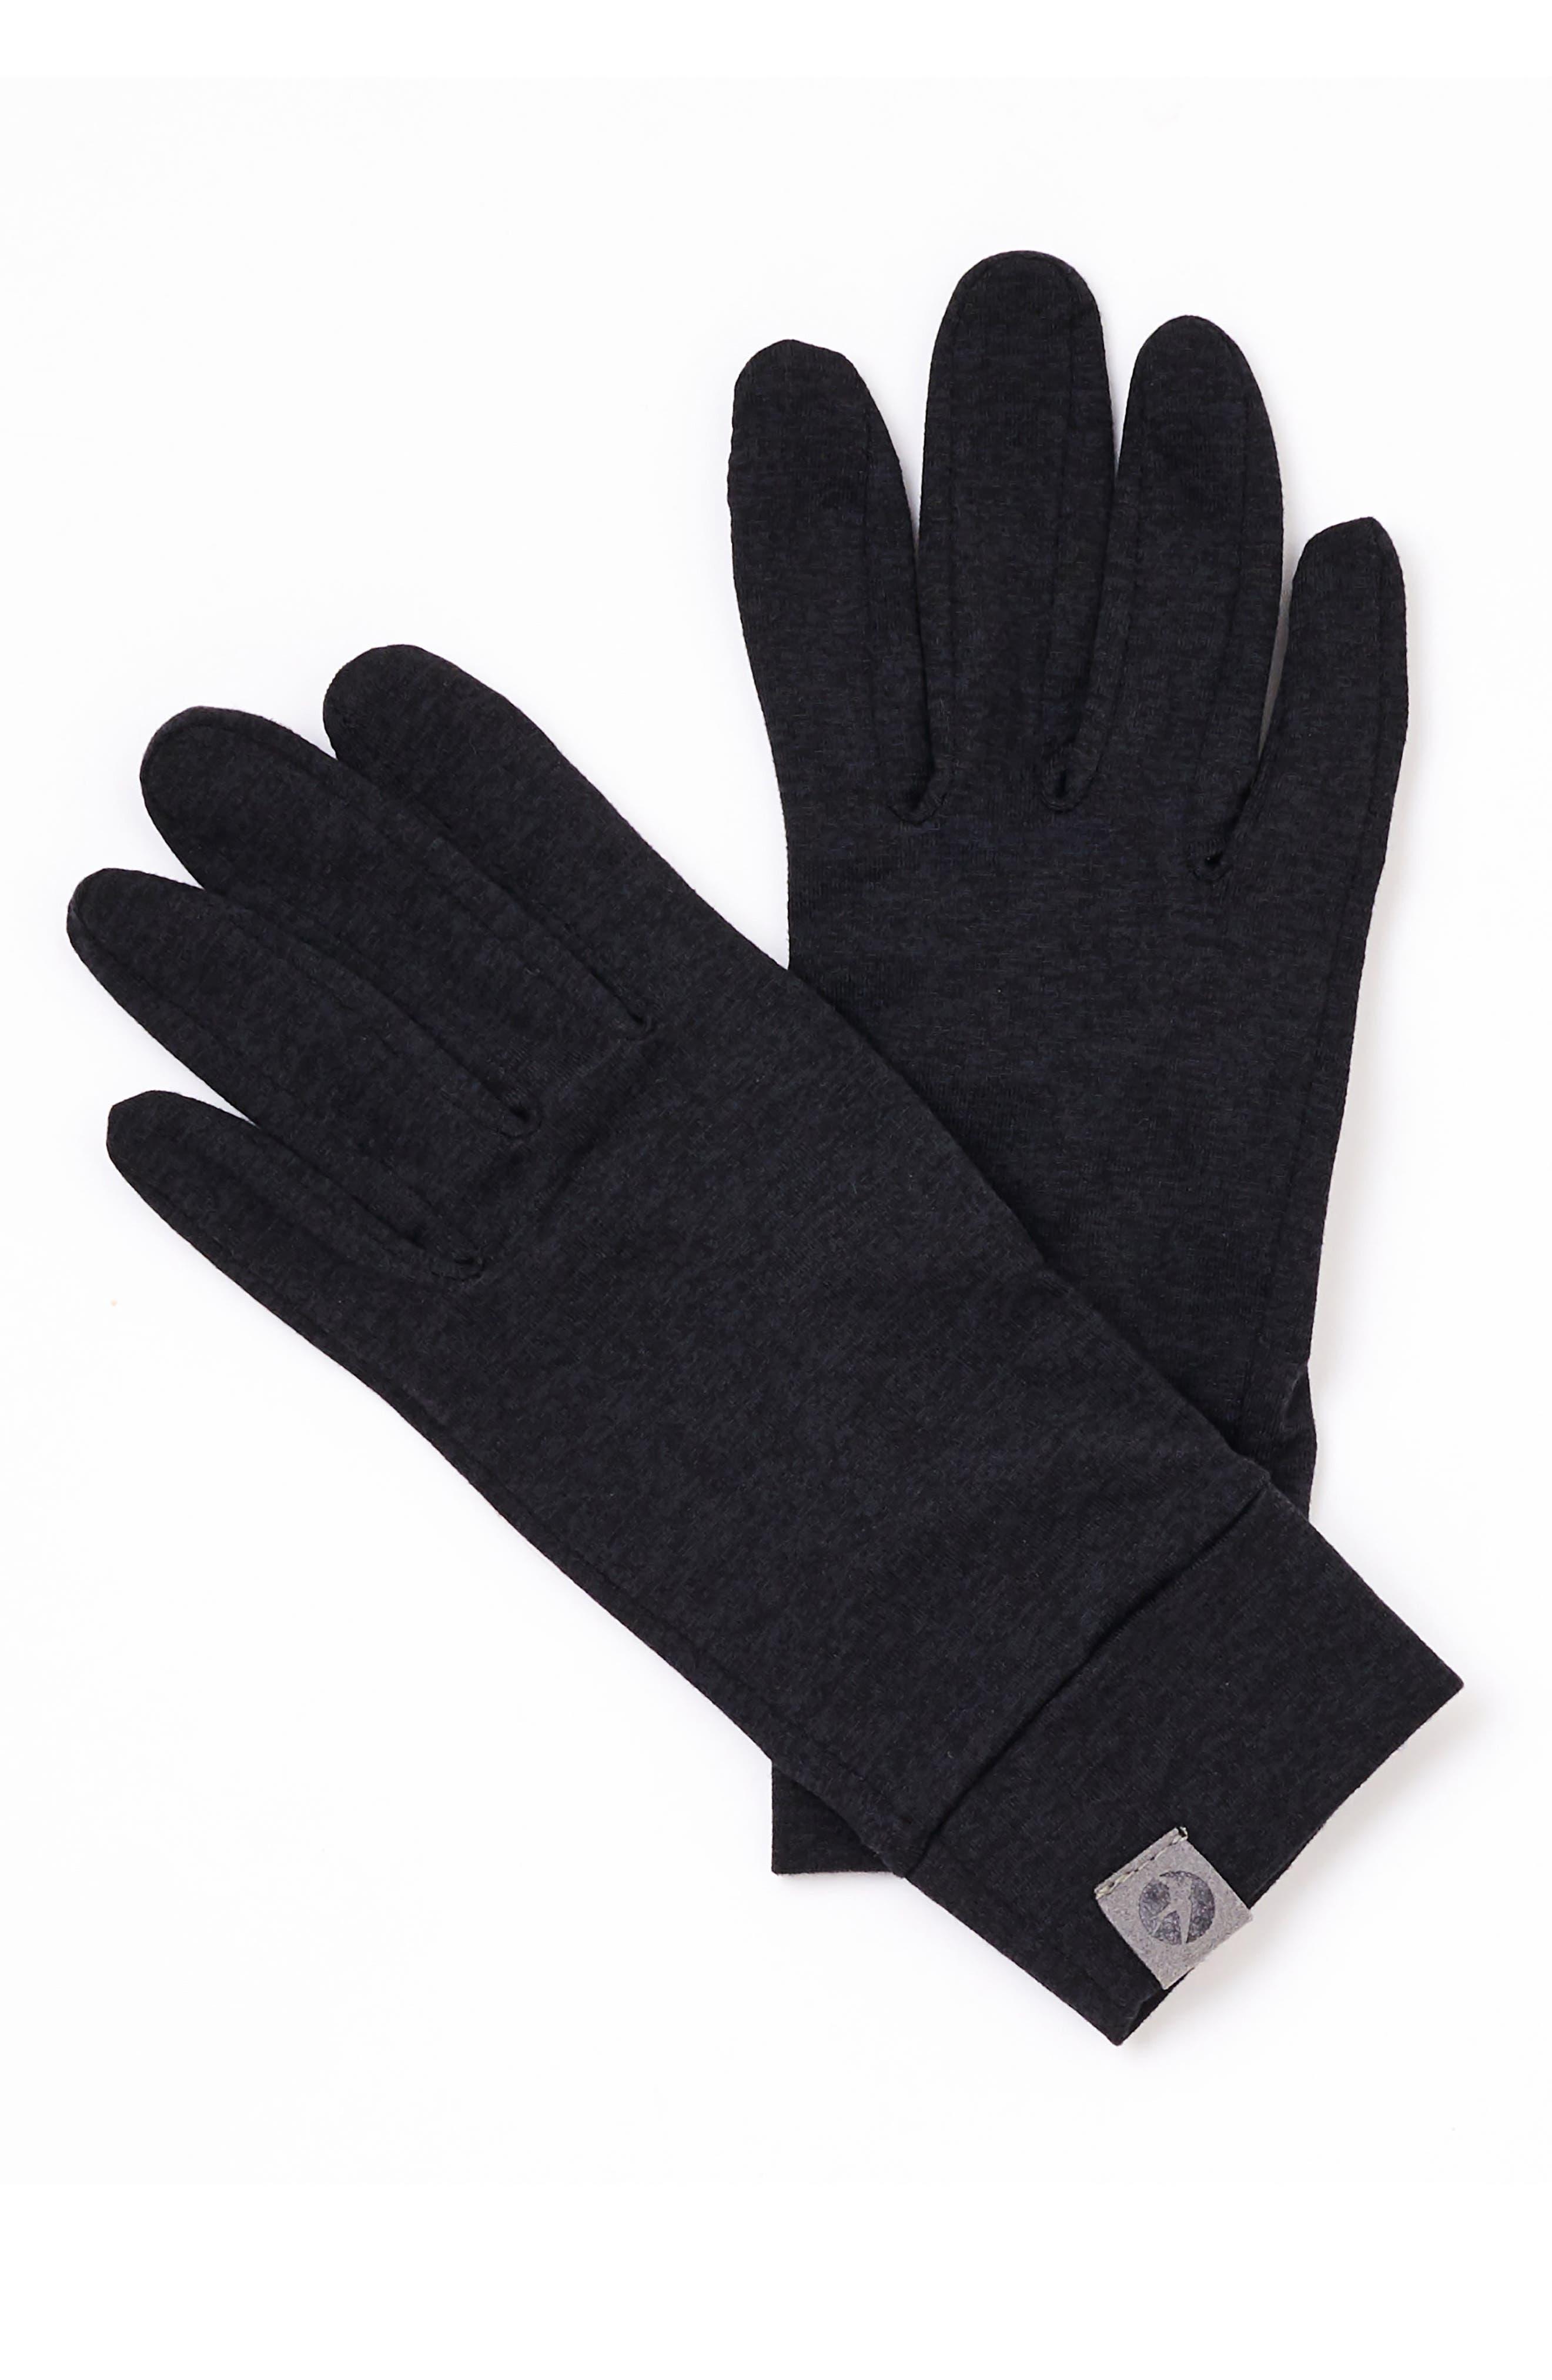 Lux Gloves,                             Main thumbnail 1, color,                             001